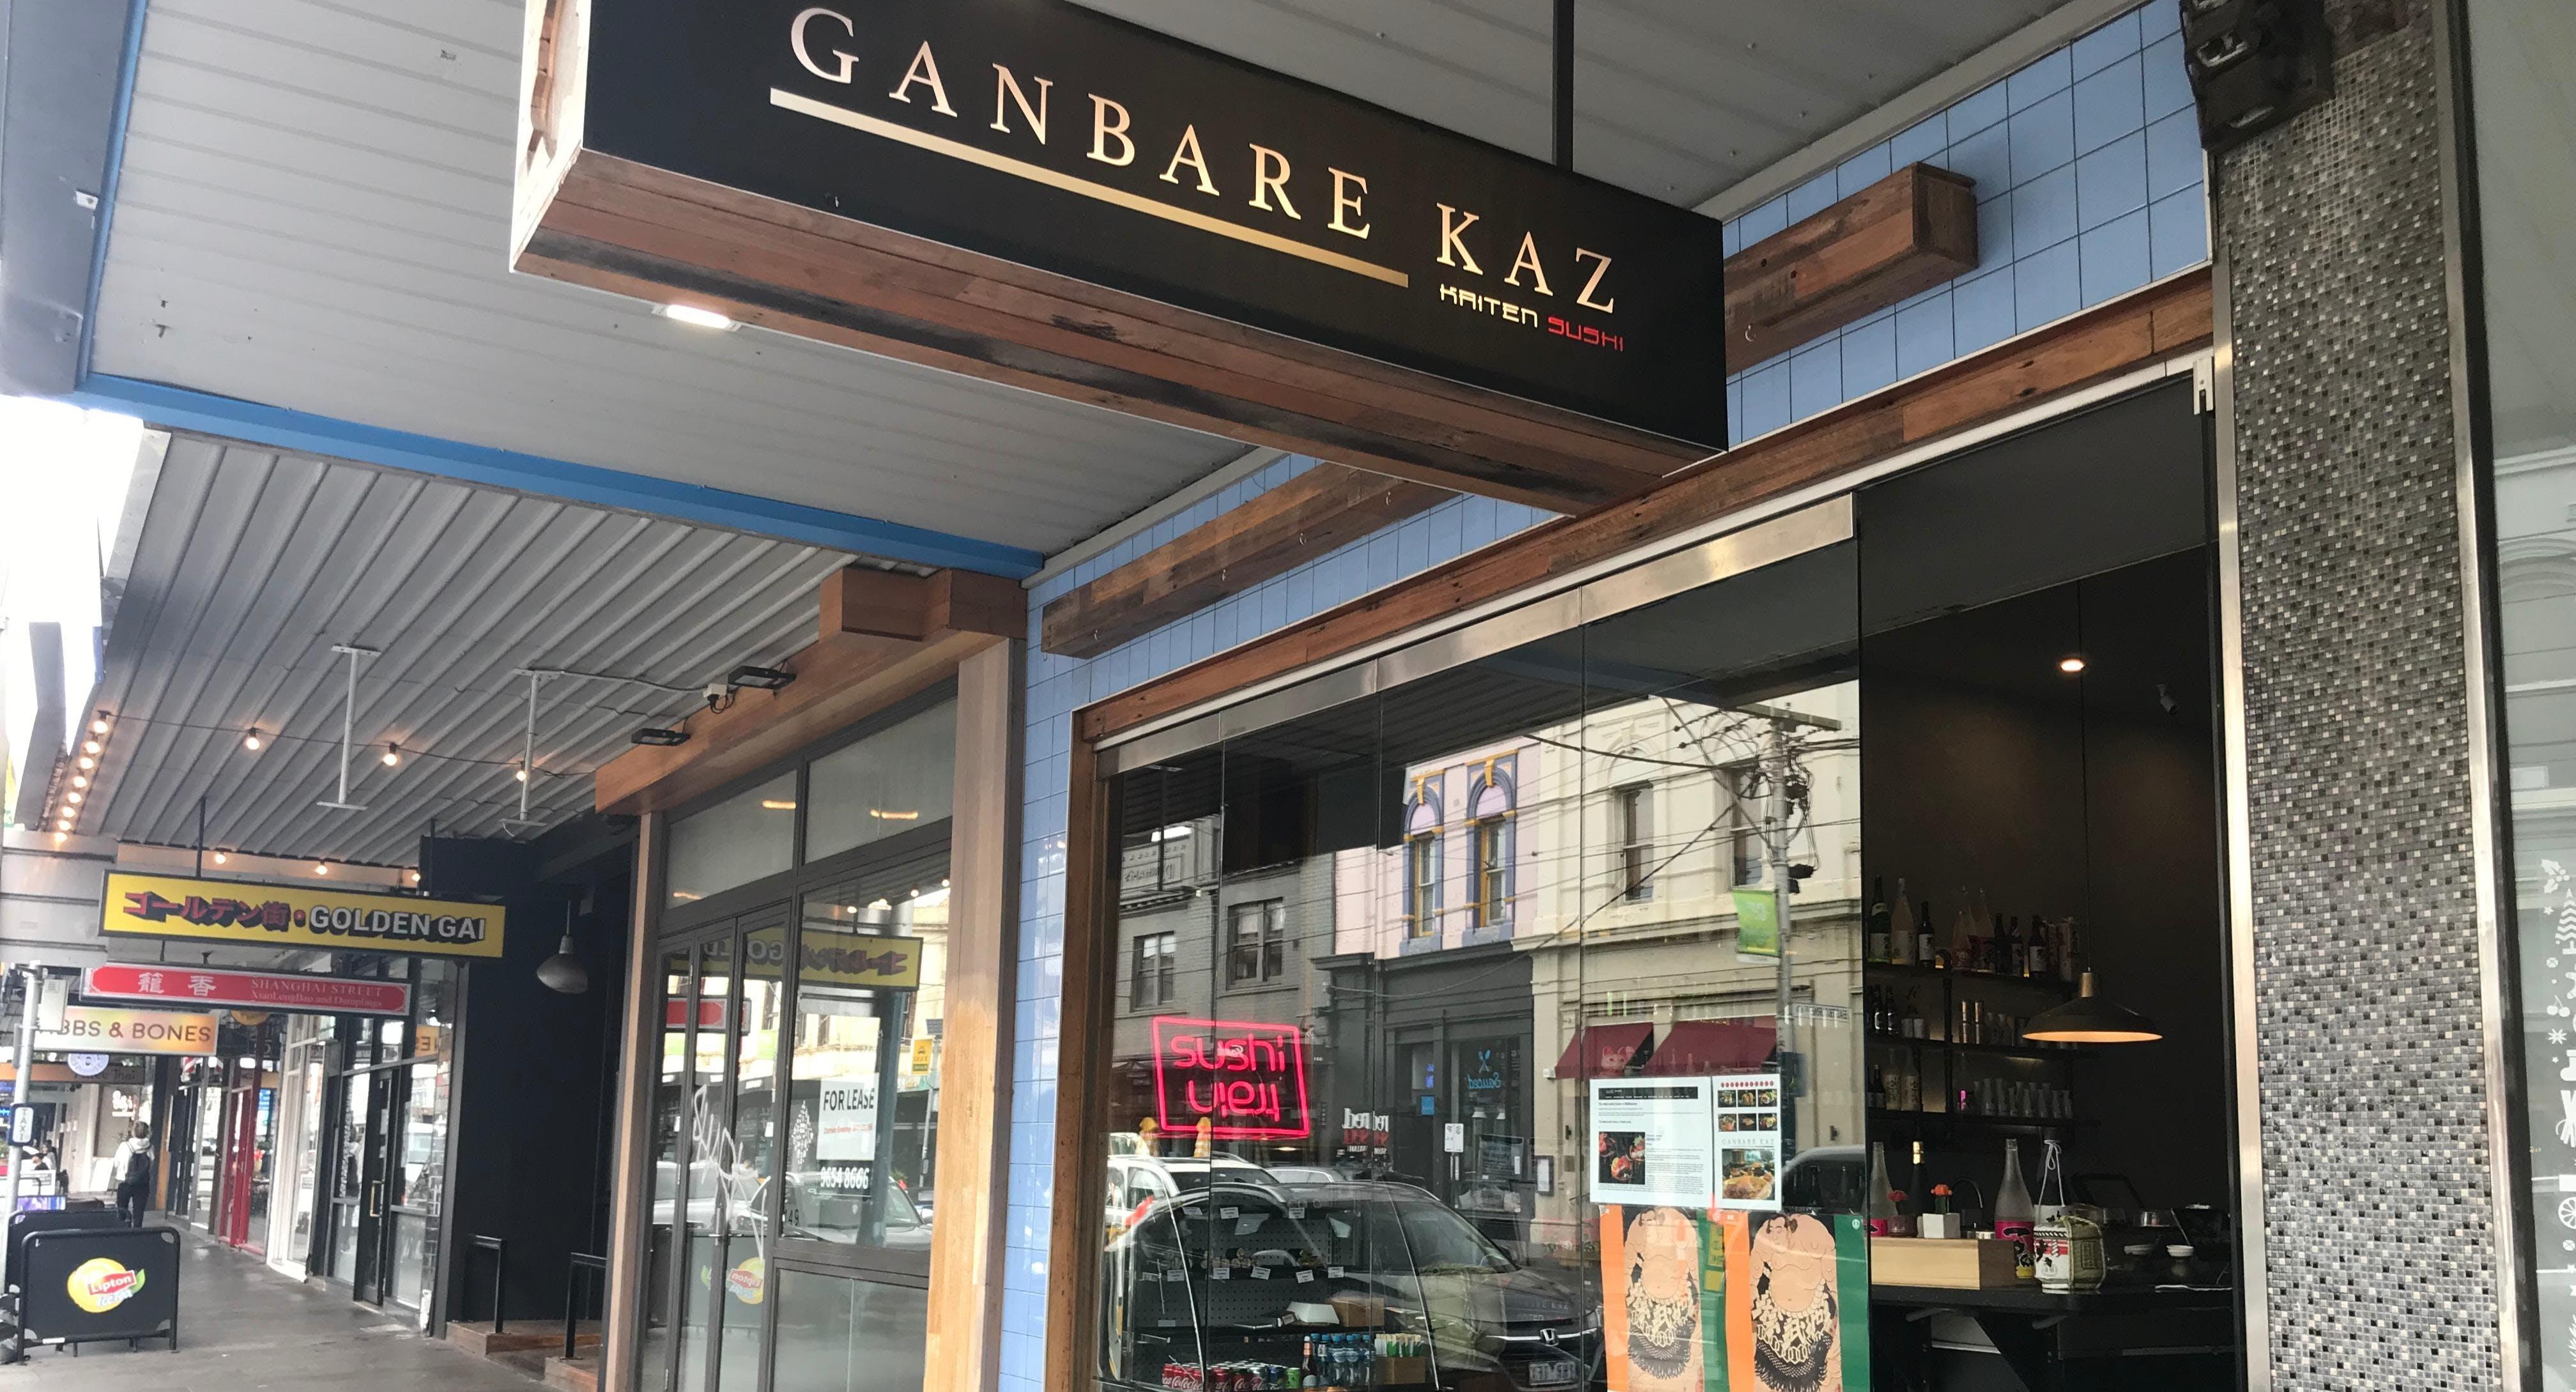 Ganbare Kaz Kaiten Sushi Melbourne image 2